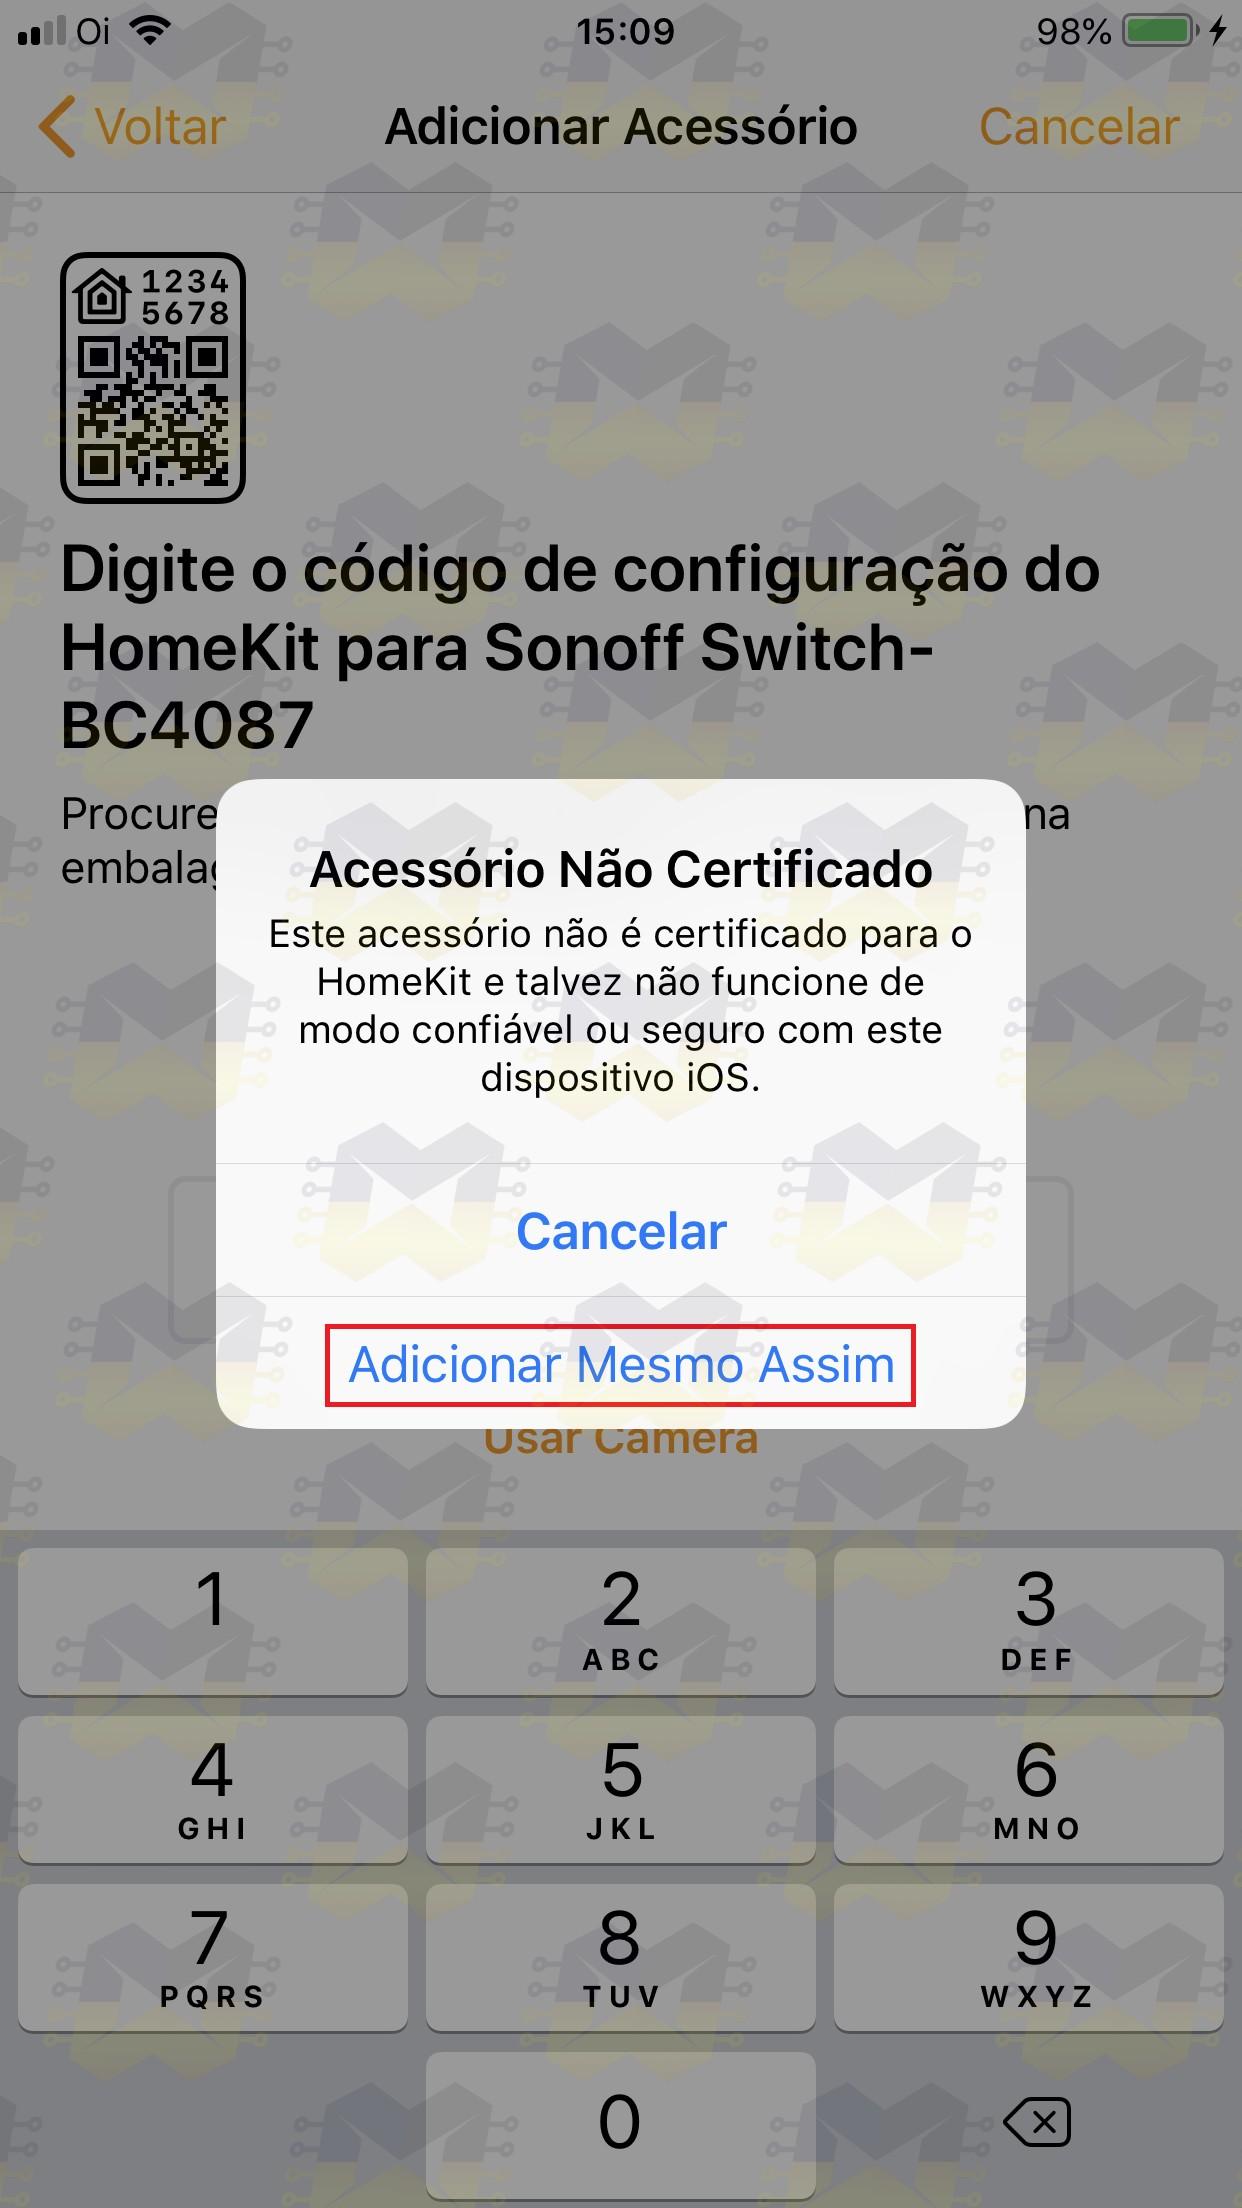 img27_sonoff_compativel_com_o_homekit_app_casa_apple_iphone_ipad_ios_mac_watch_homepod_tv_arduino_esp8266_automacao_iot_rele